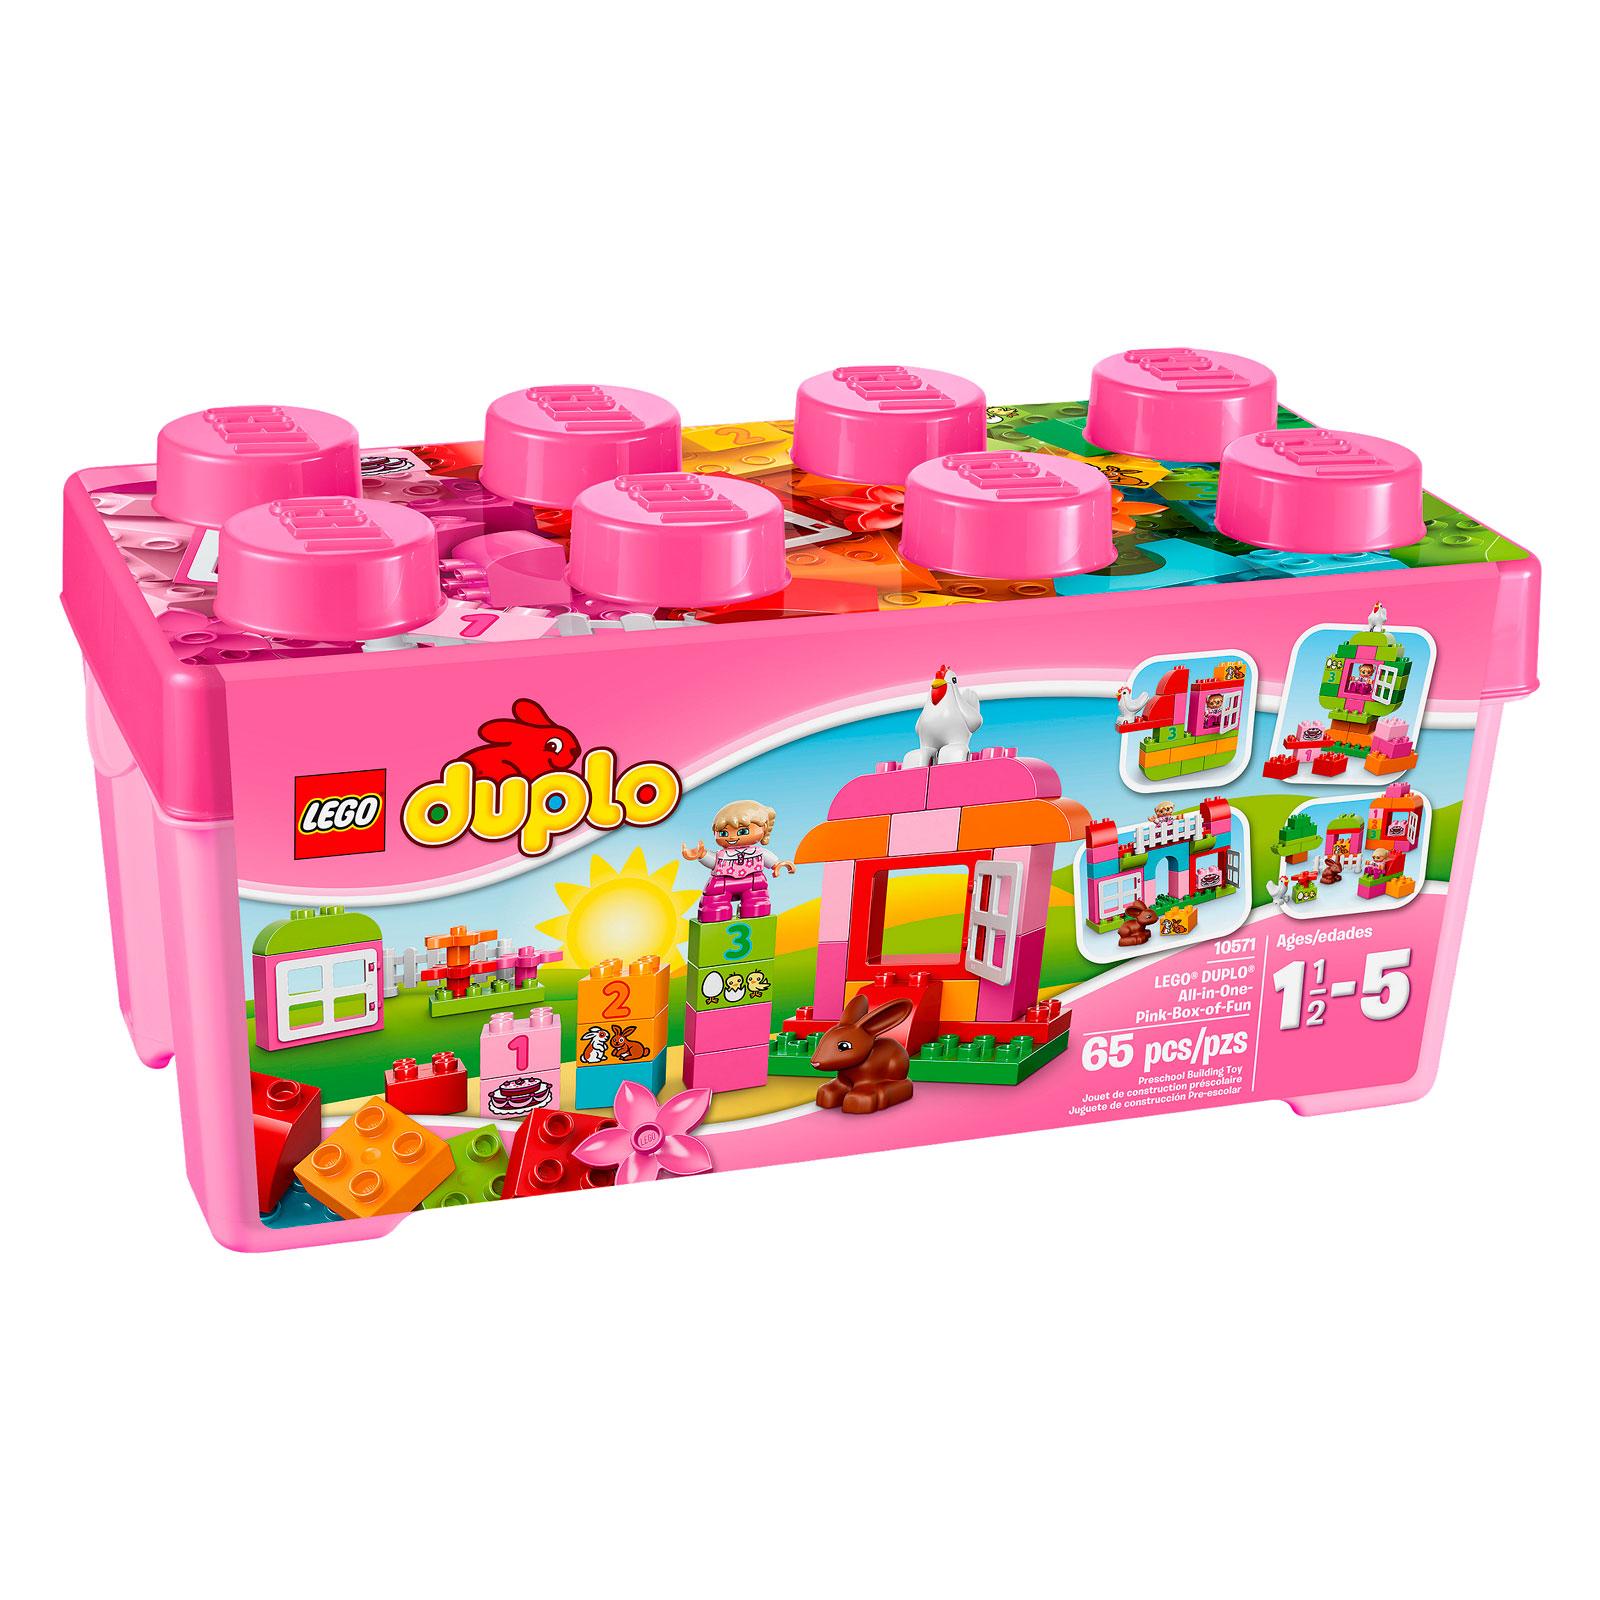 ����������� LEGO Duplo 10571 ������ ������: ������� � ������